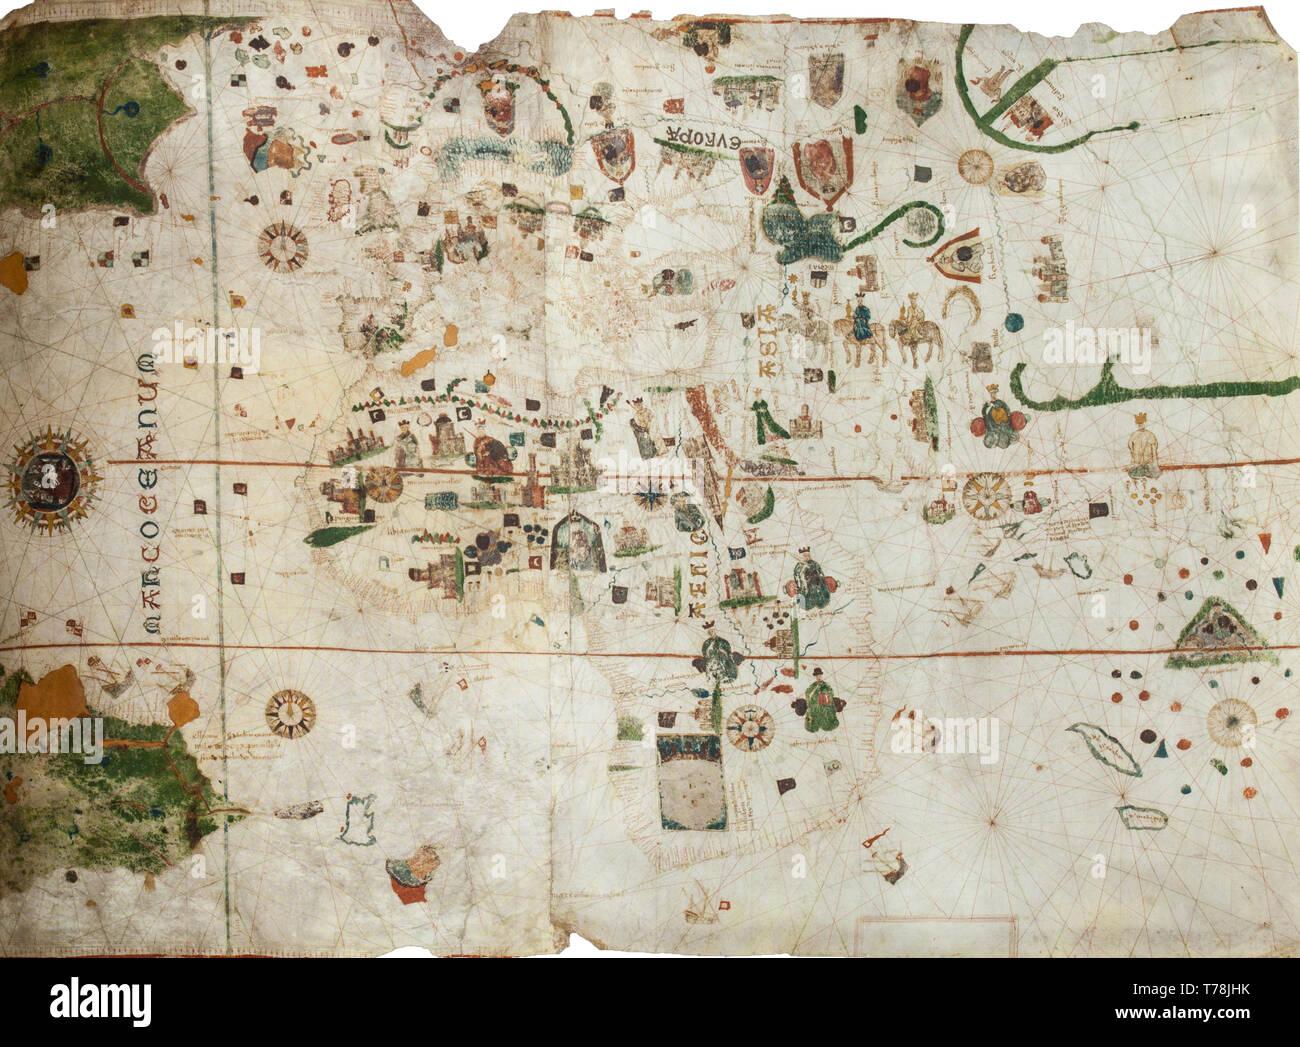 Jerez de los Caballeros, Spain - April 15th, 2019: Map or chart of Juan de la Cosa, fragment. Reproduction at House-Museum of Nuñez de Balboa original - Stock Image